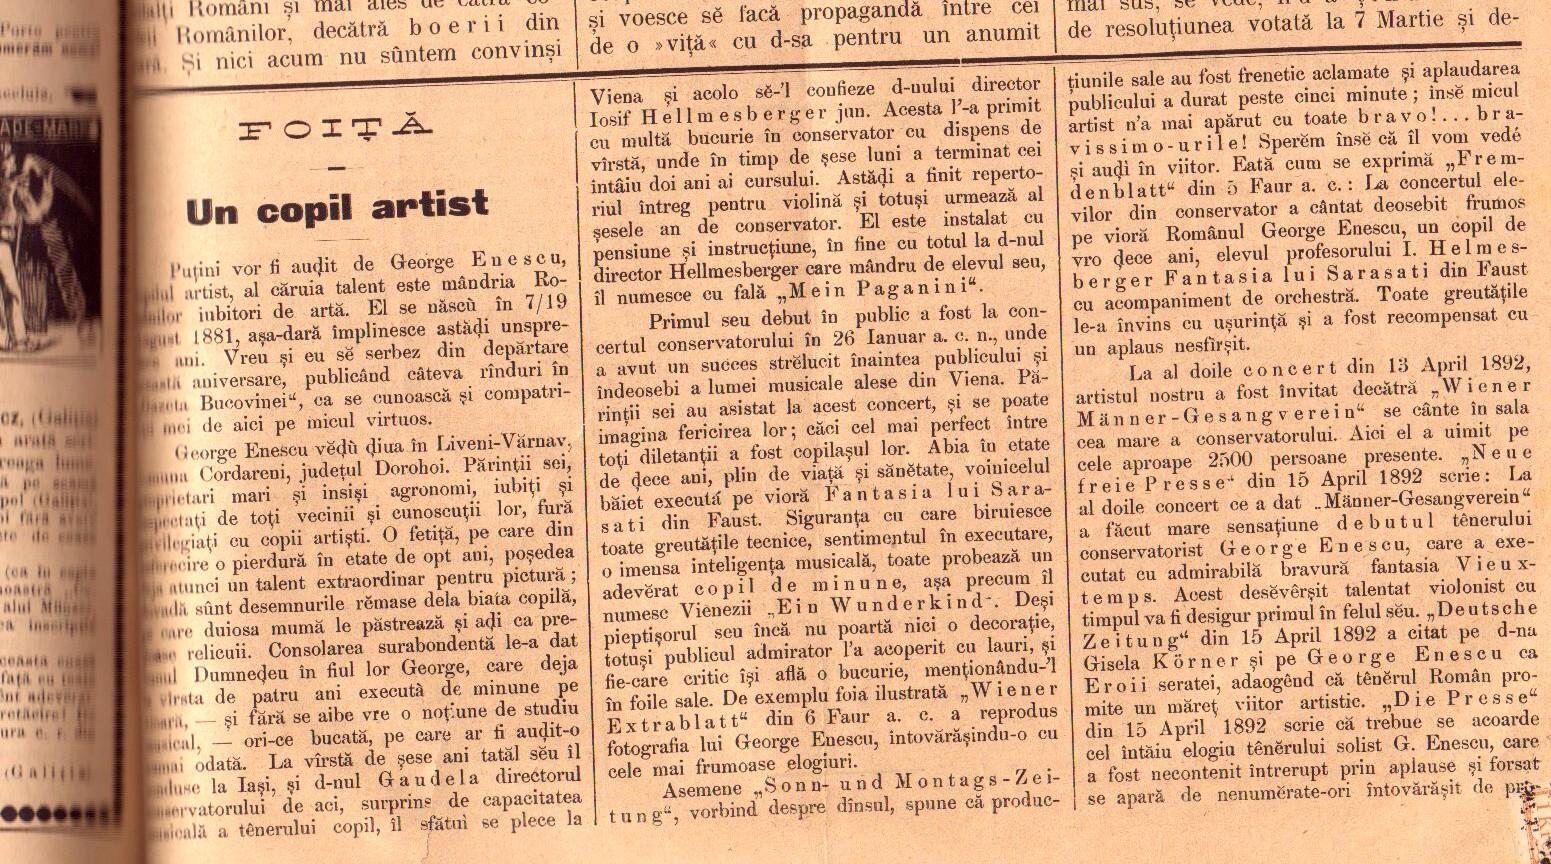 GAZETA BUCOVINEI, 7/19 August 1892